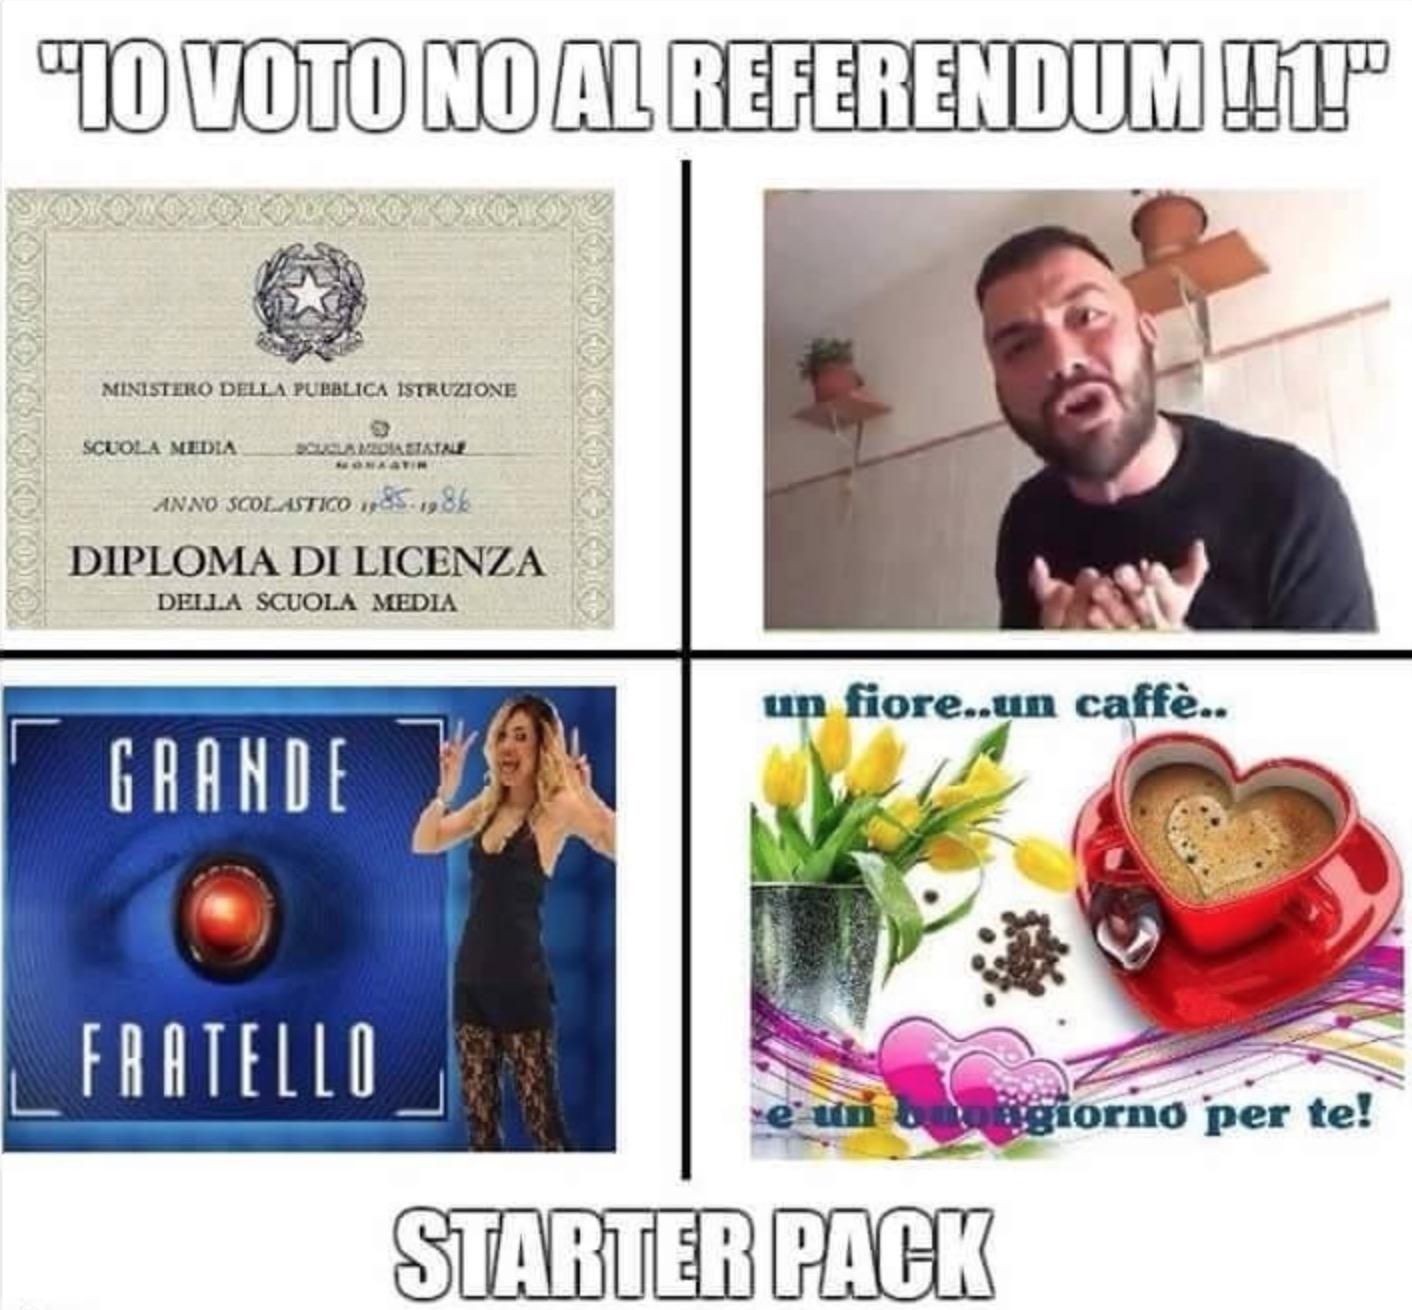 Io voto no al referendum